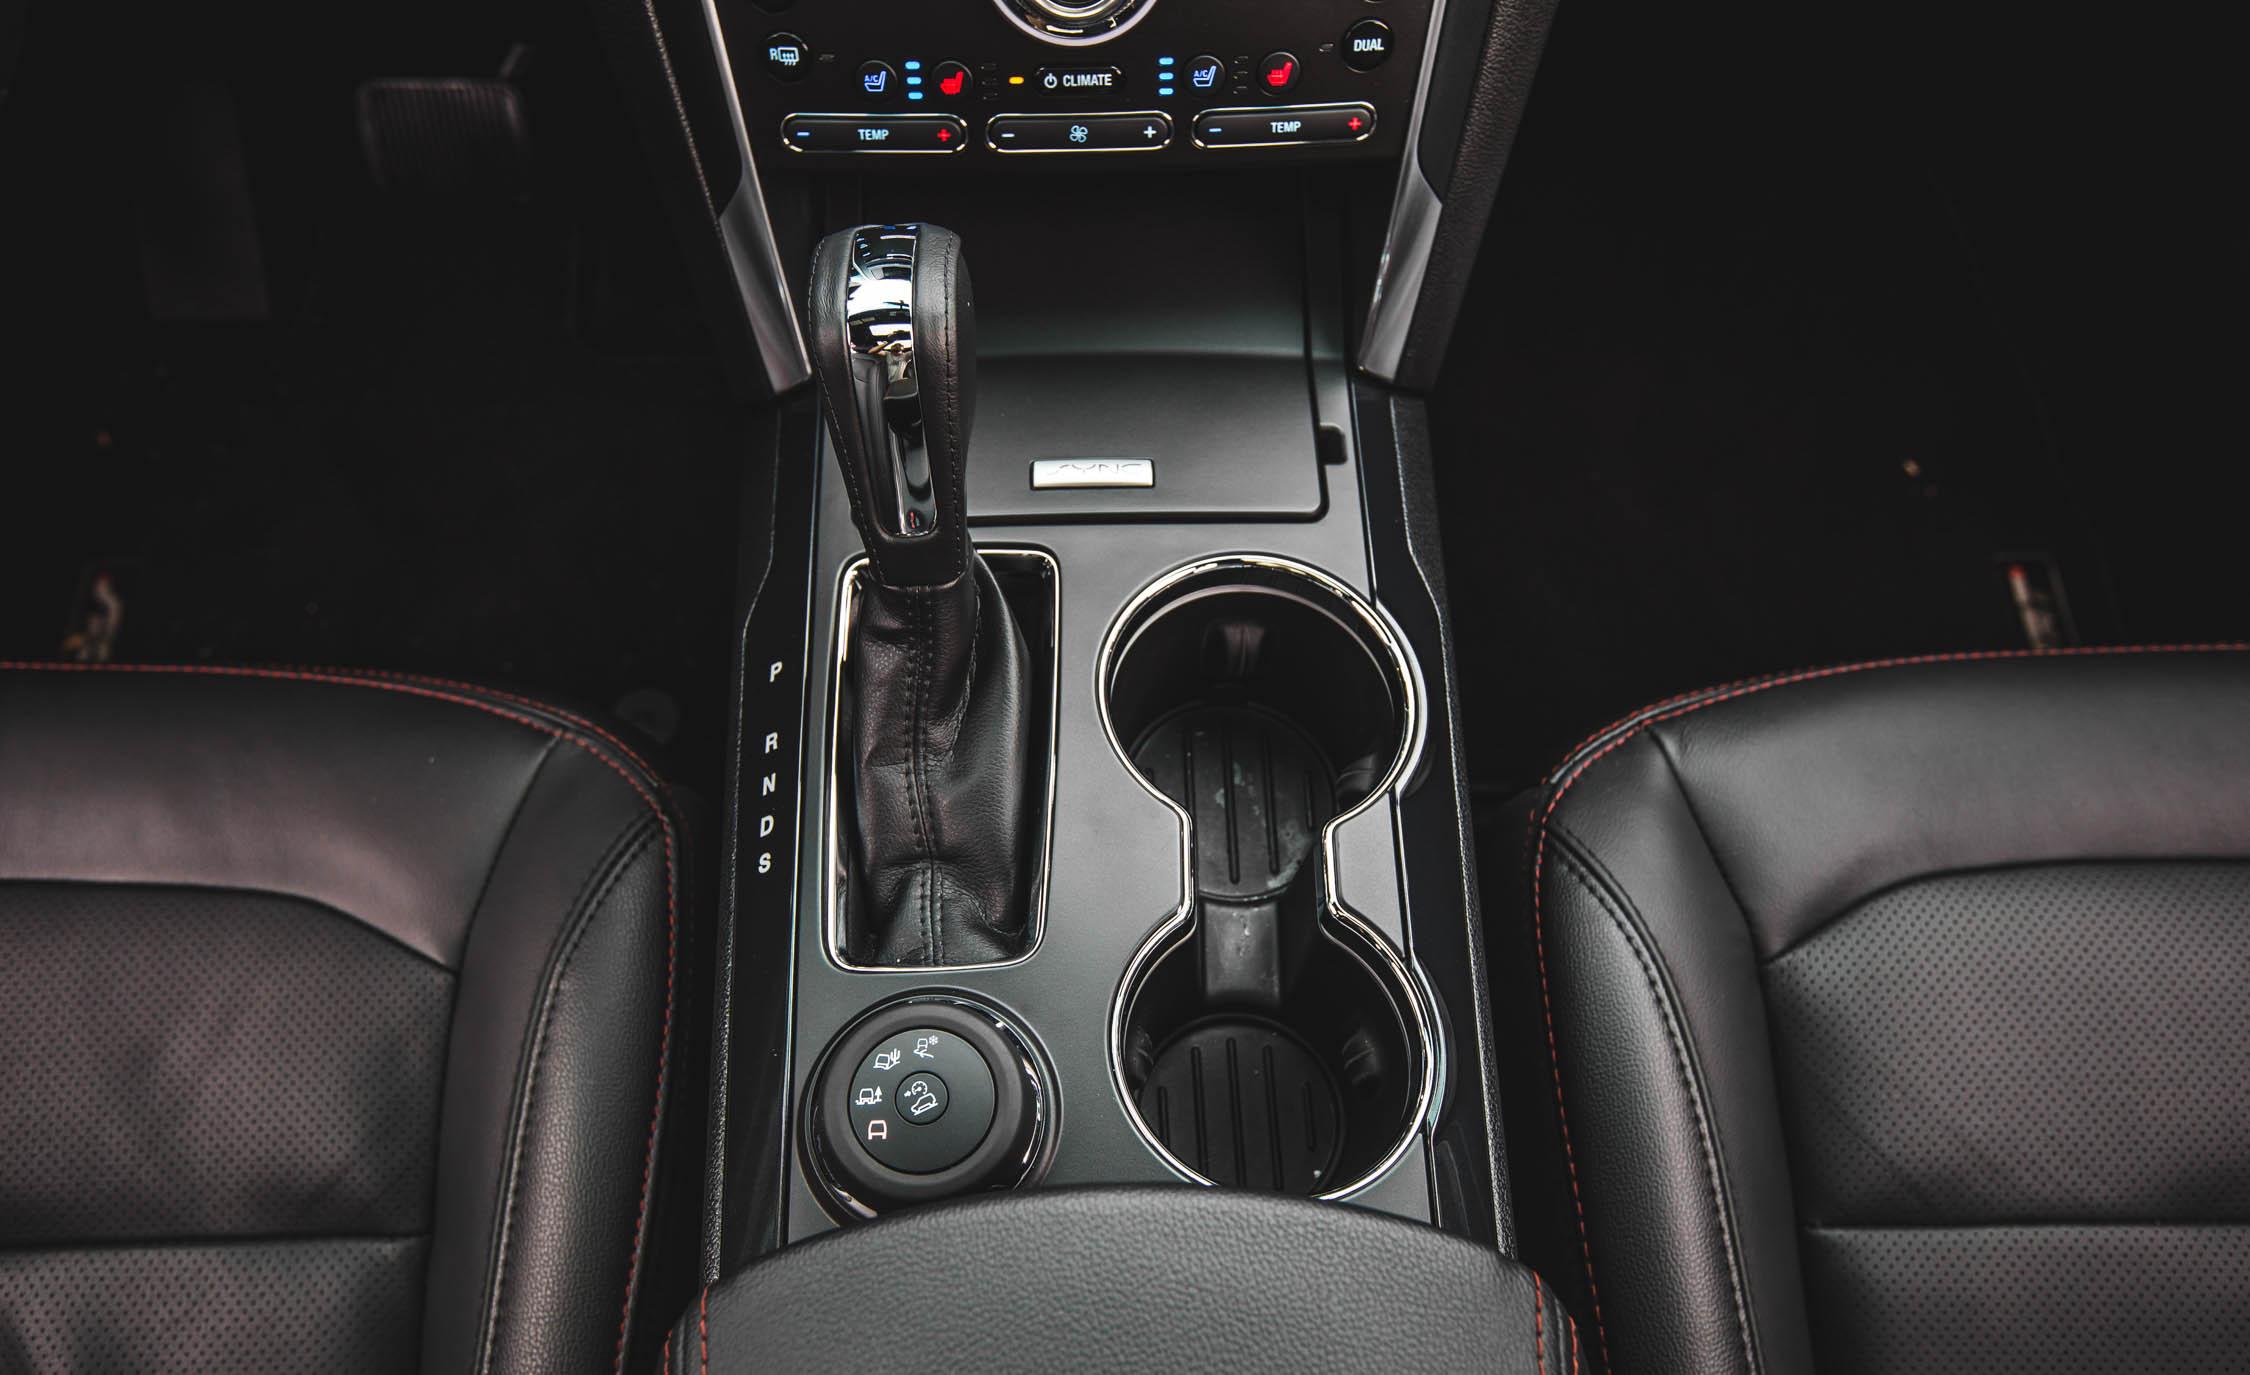 2016 Ford Explorer Sport Interior Gear Shift Knob